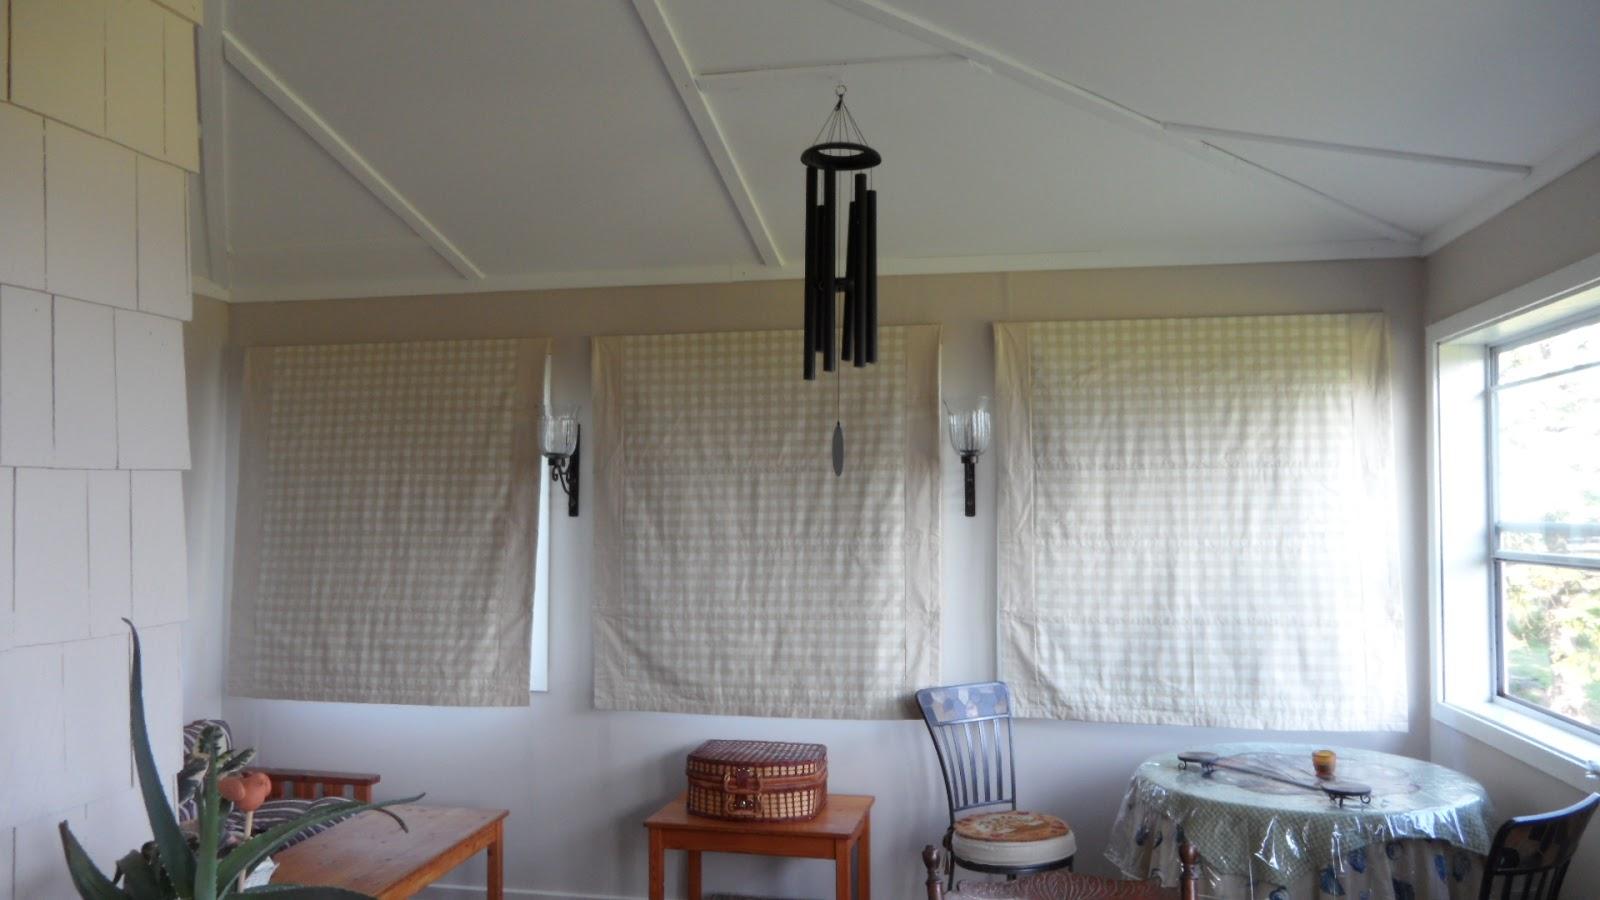 kyrotime july begins window coverings near completion. Black Bedroom Furniture Sets. Home Design Ideas